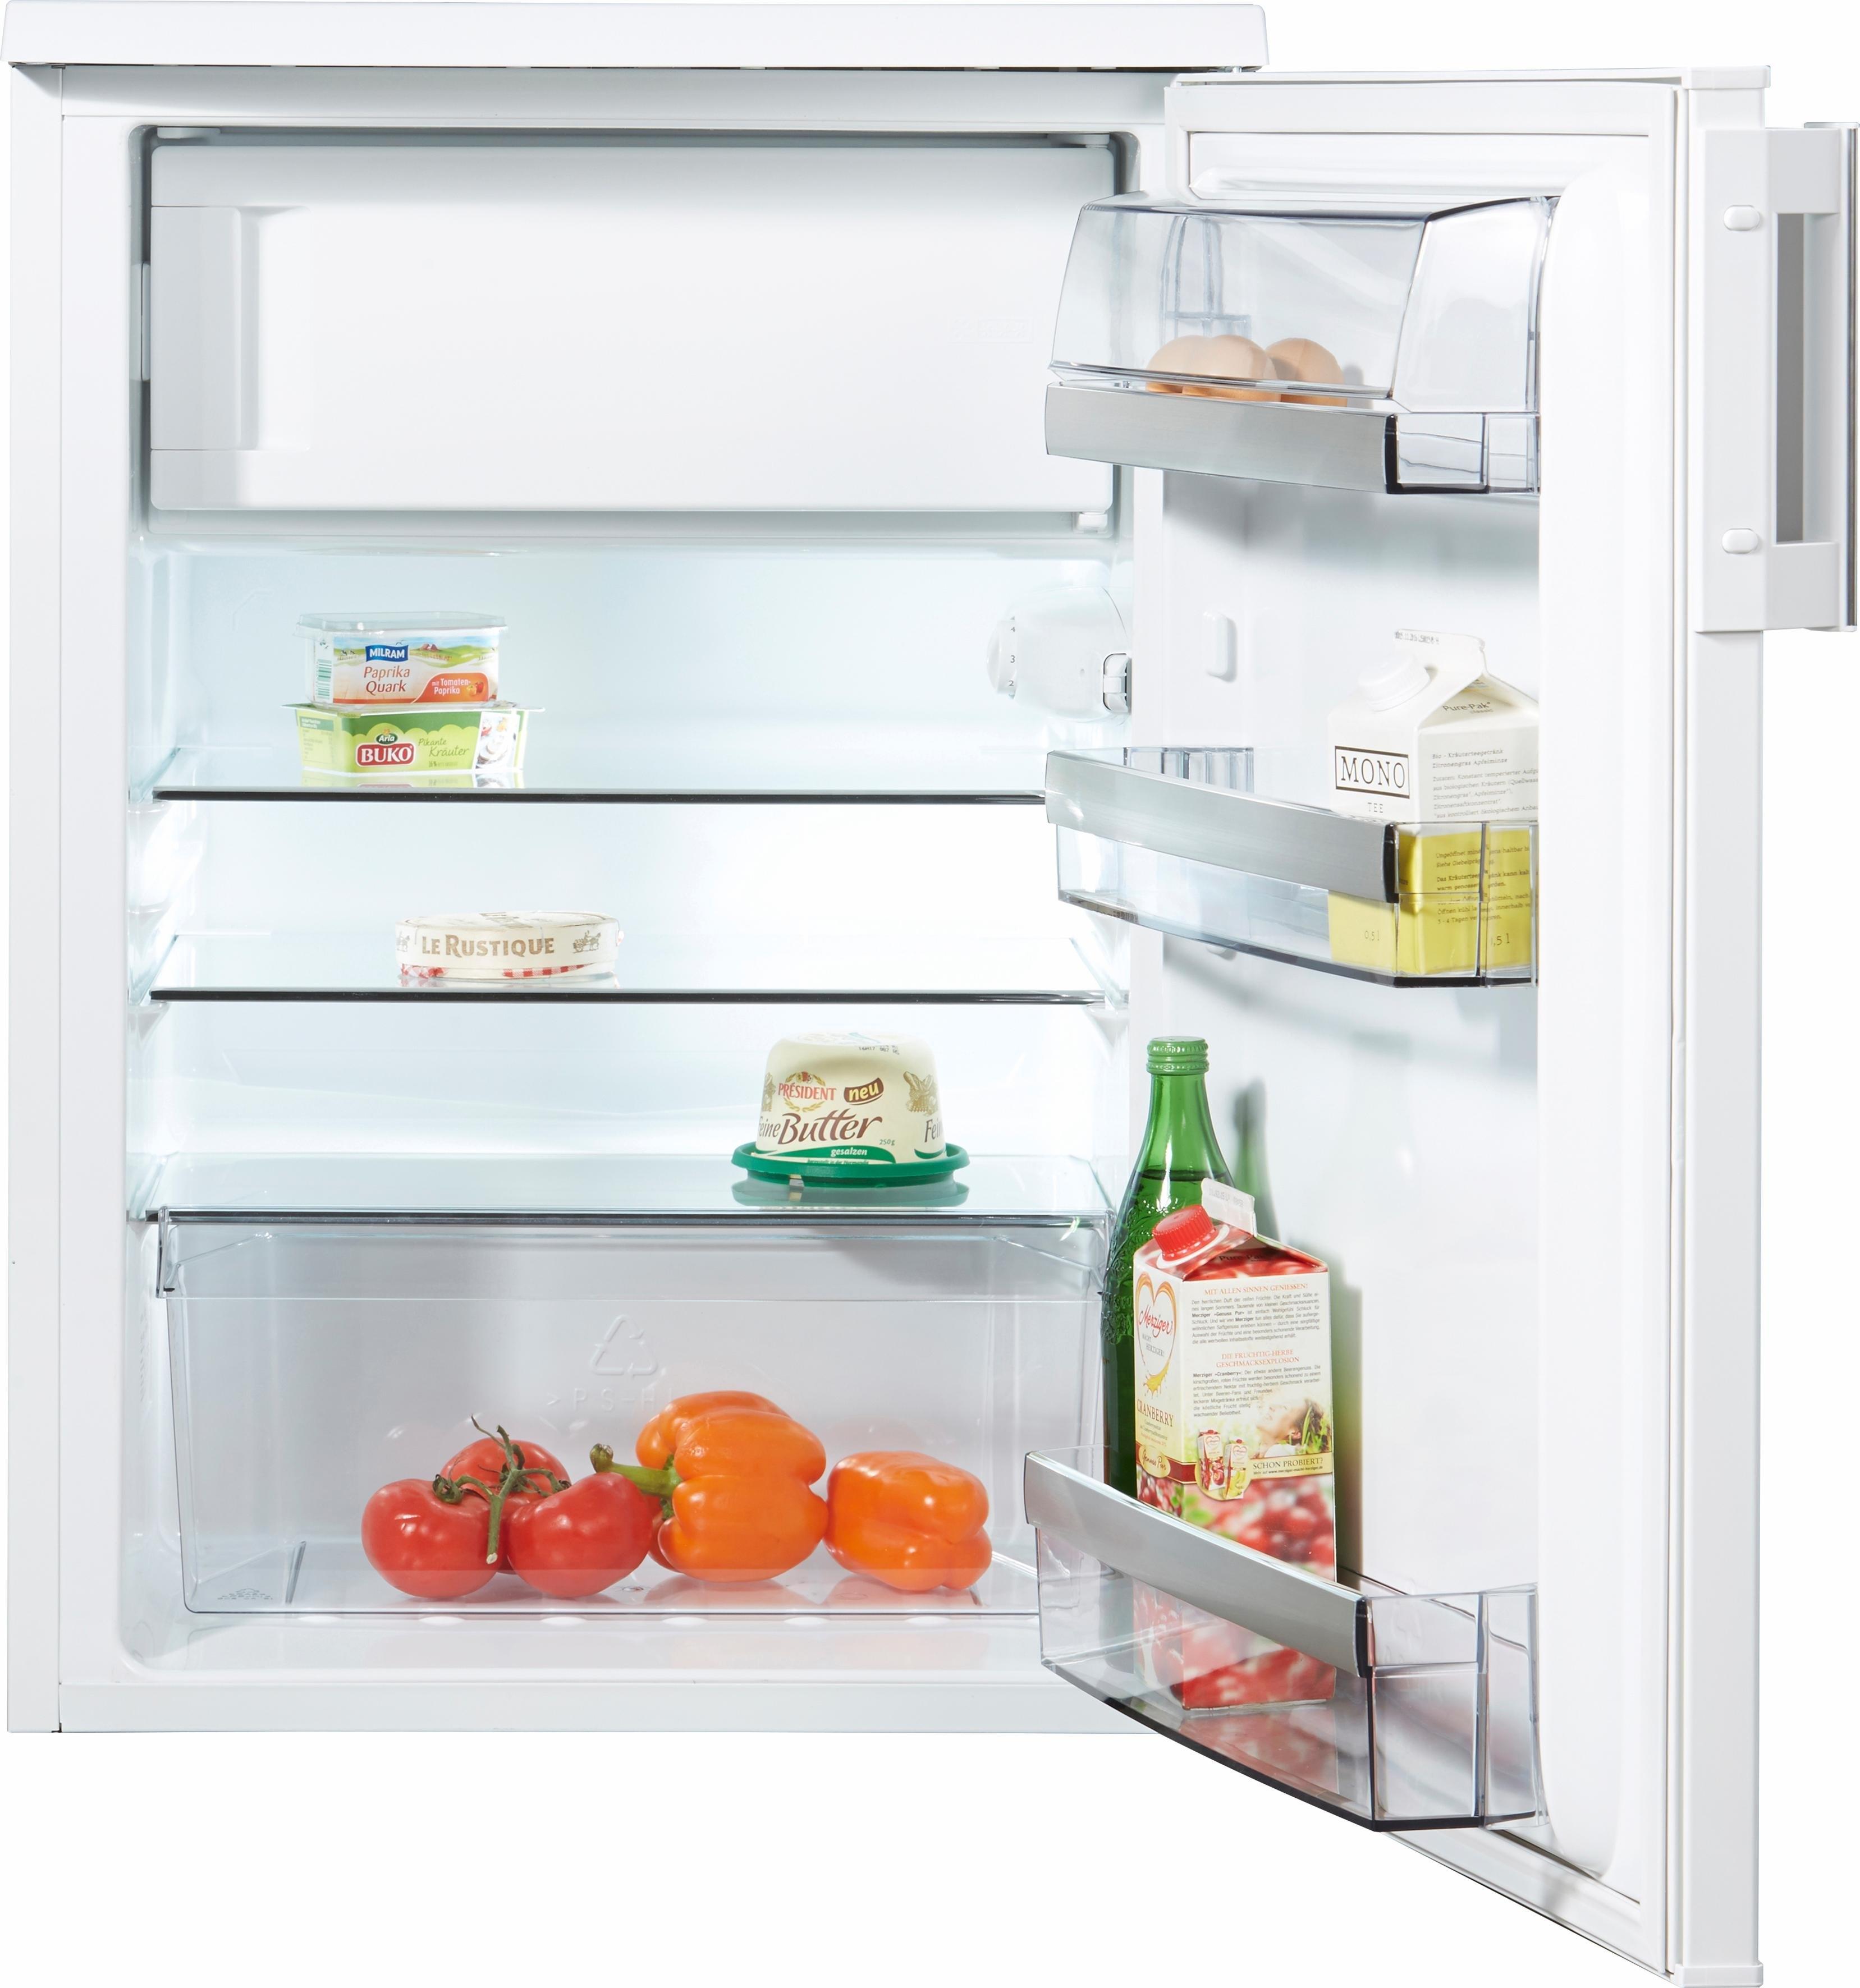 AEG Electrolux AEG koelkast RTB91431AW, A+++, 85 cm hoog veilig op otto.nl kopen